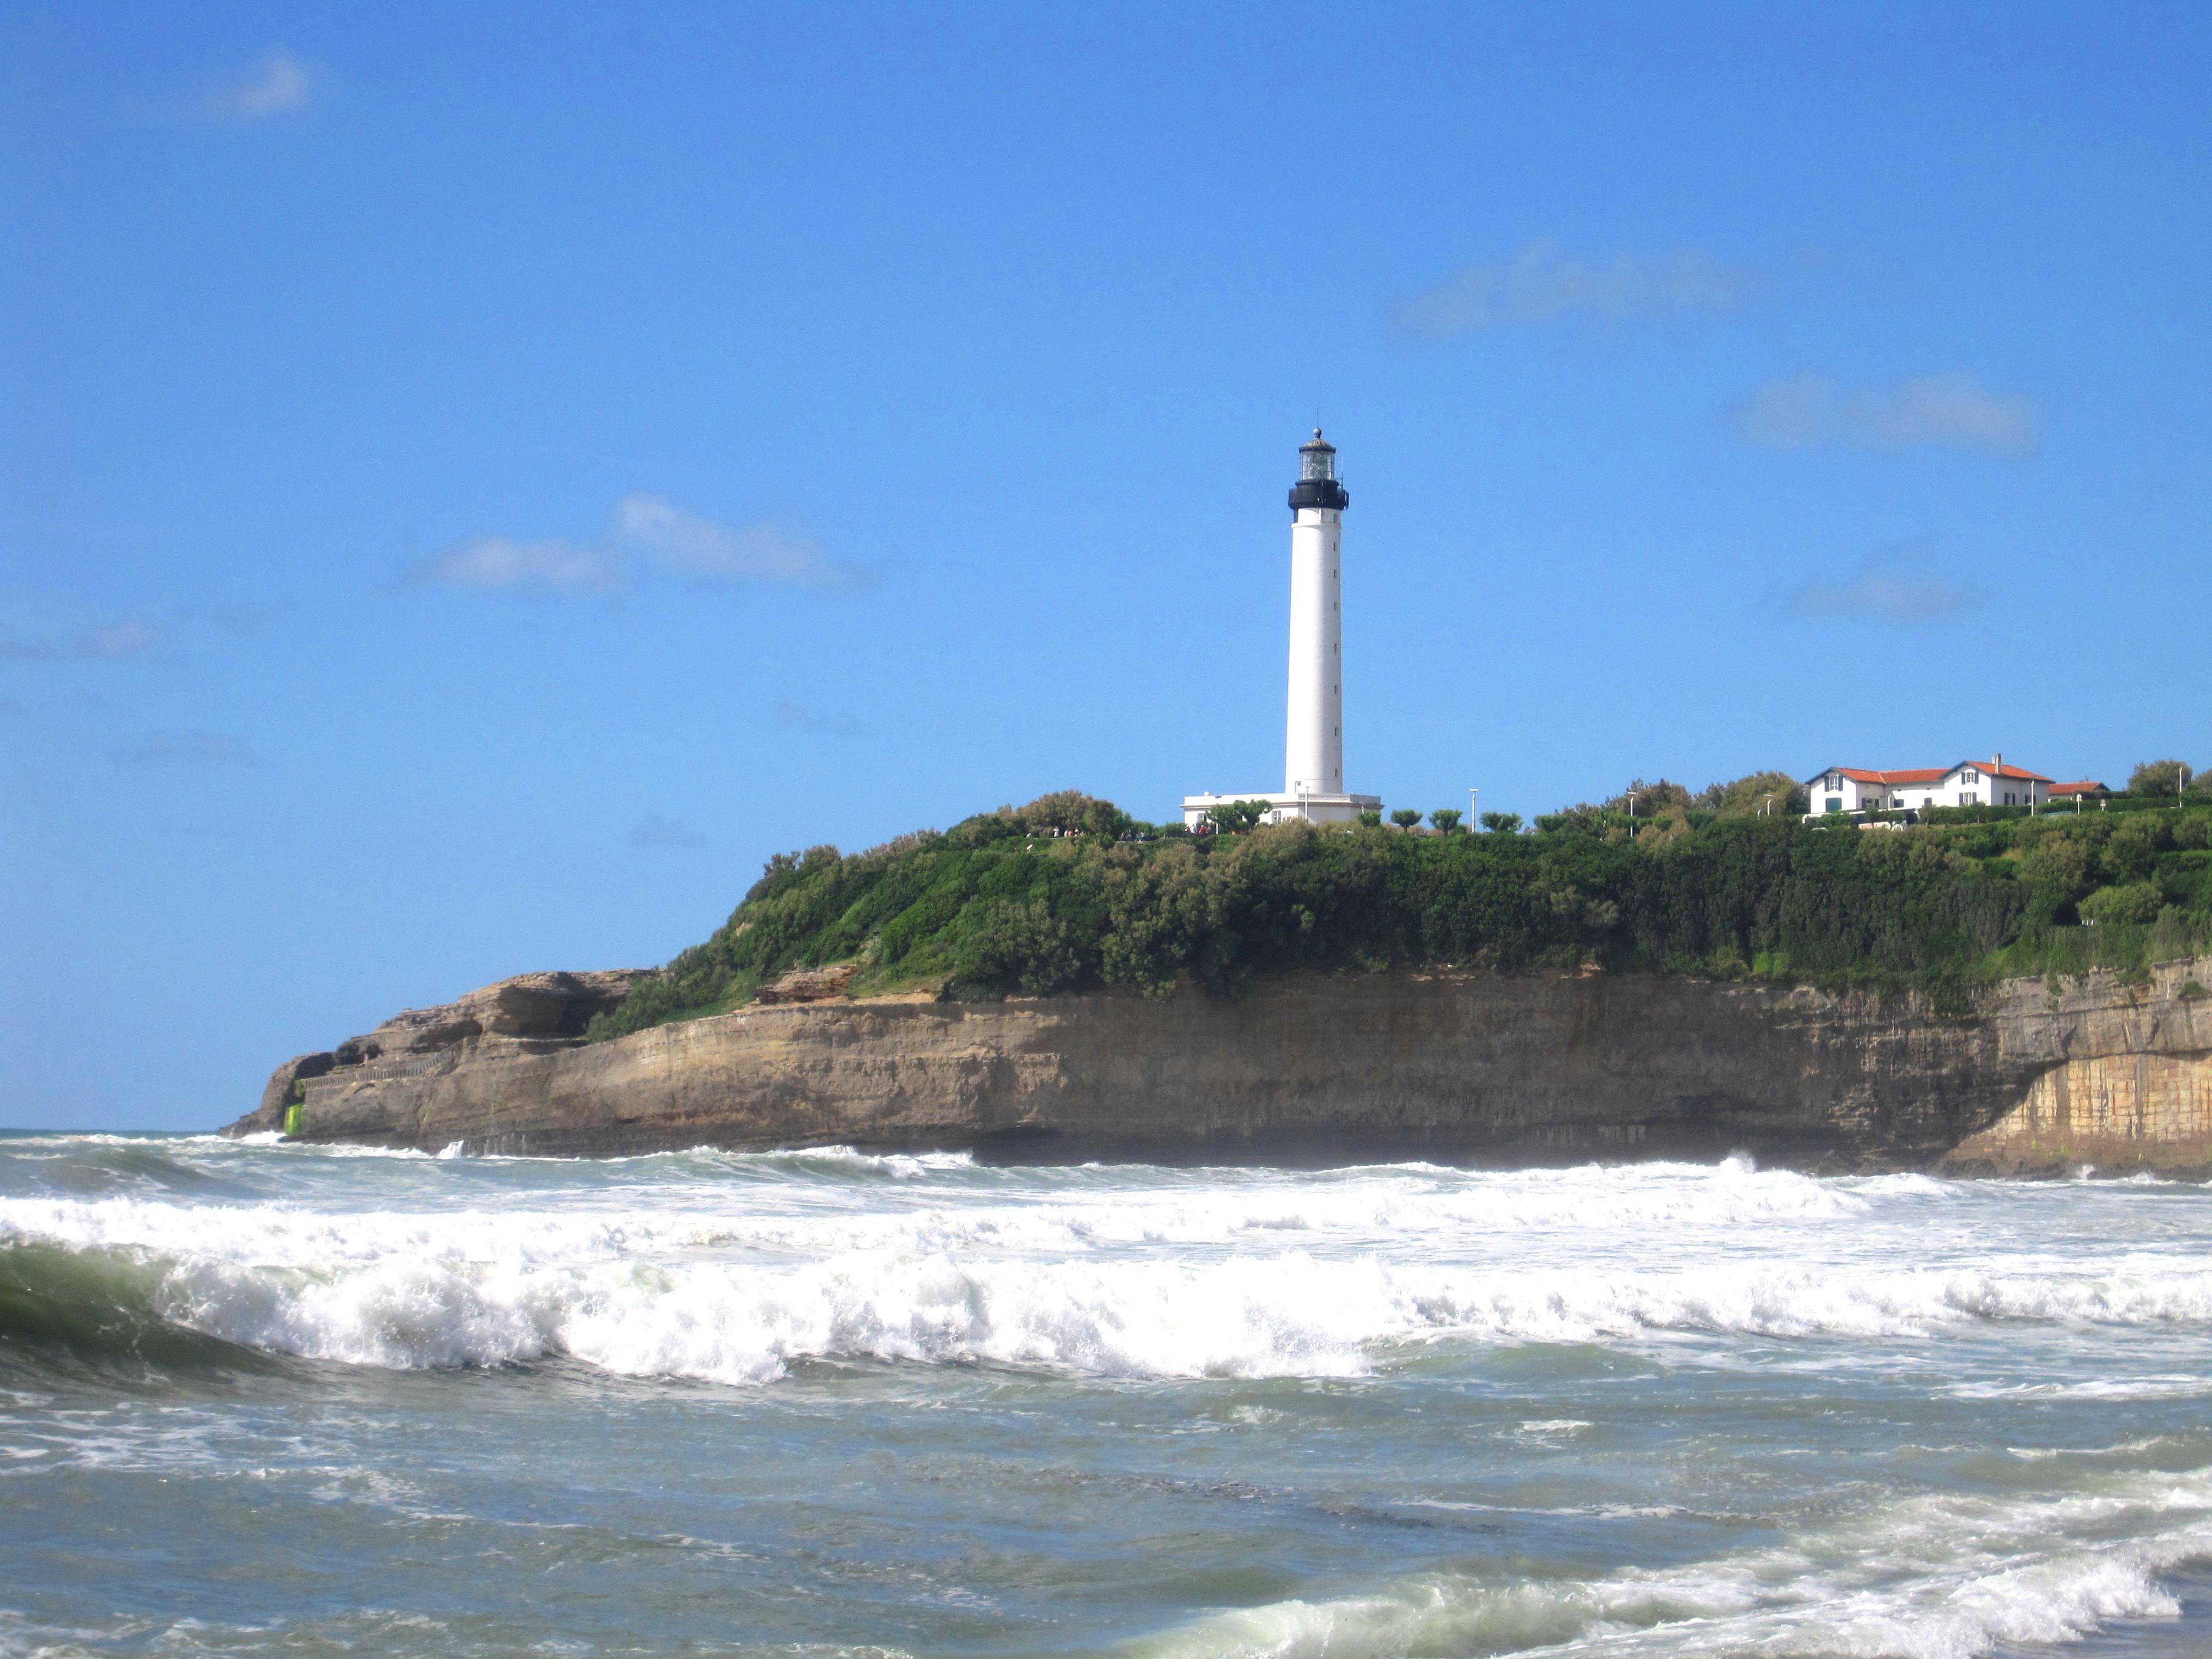 Week end biarritz le takablog - Phare de biarritz ...